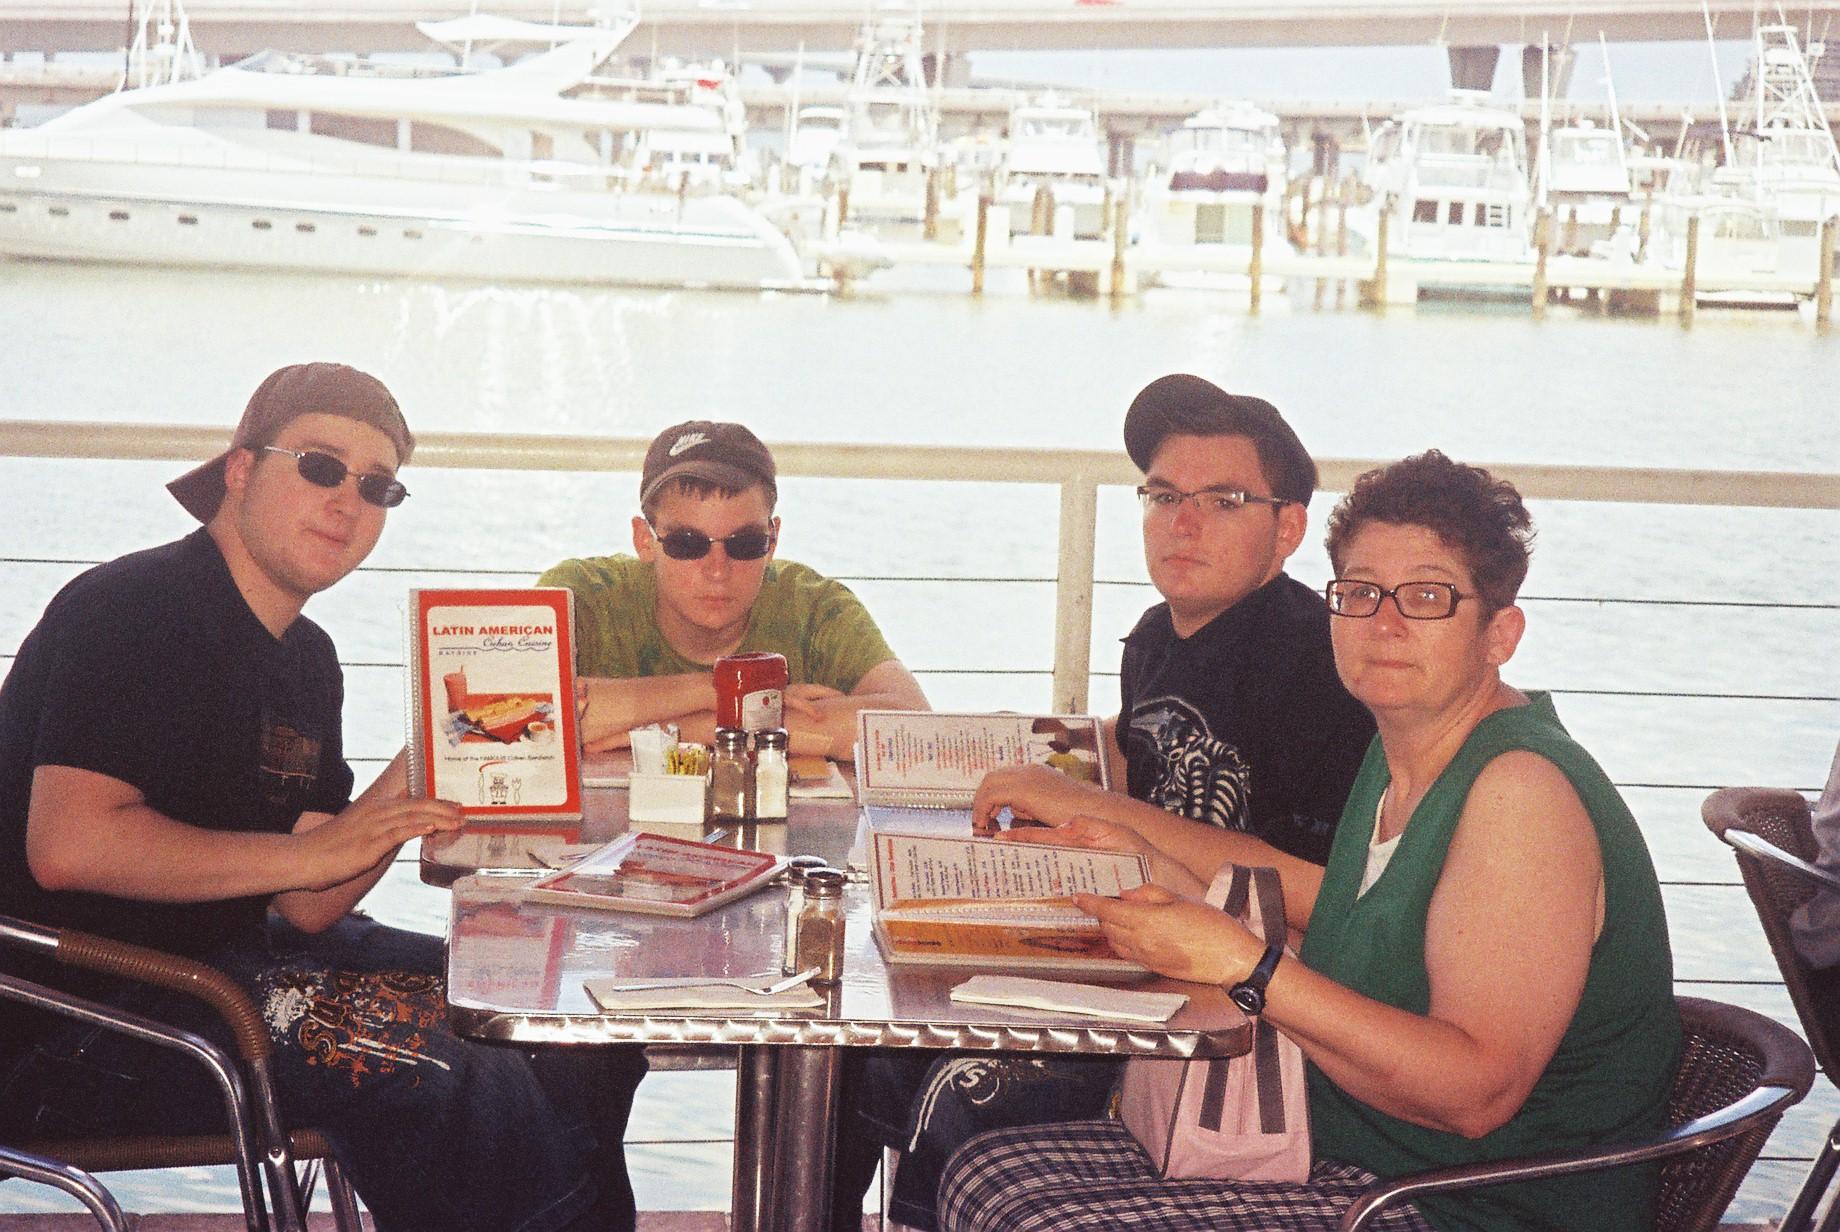 miami-latin-american-cafeteria-bayside-aug09